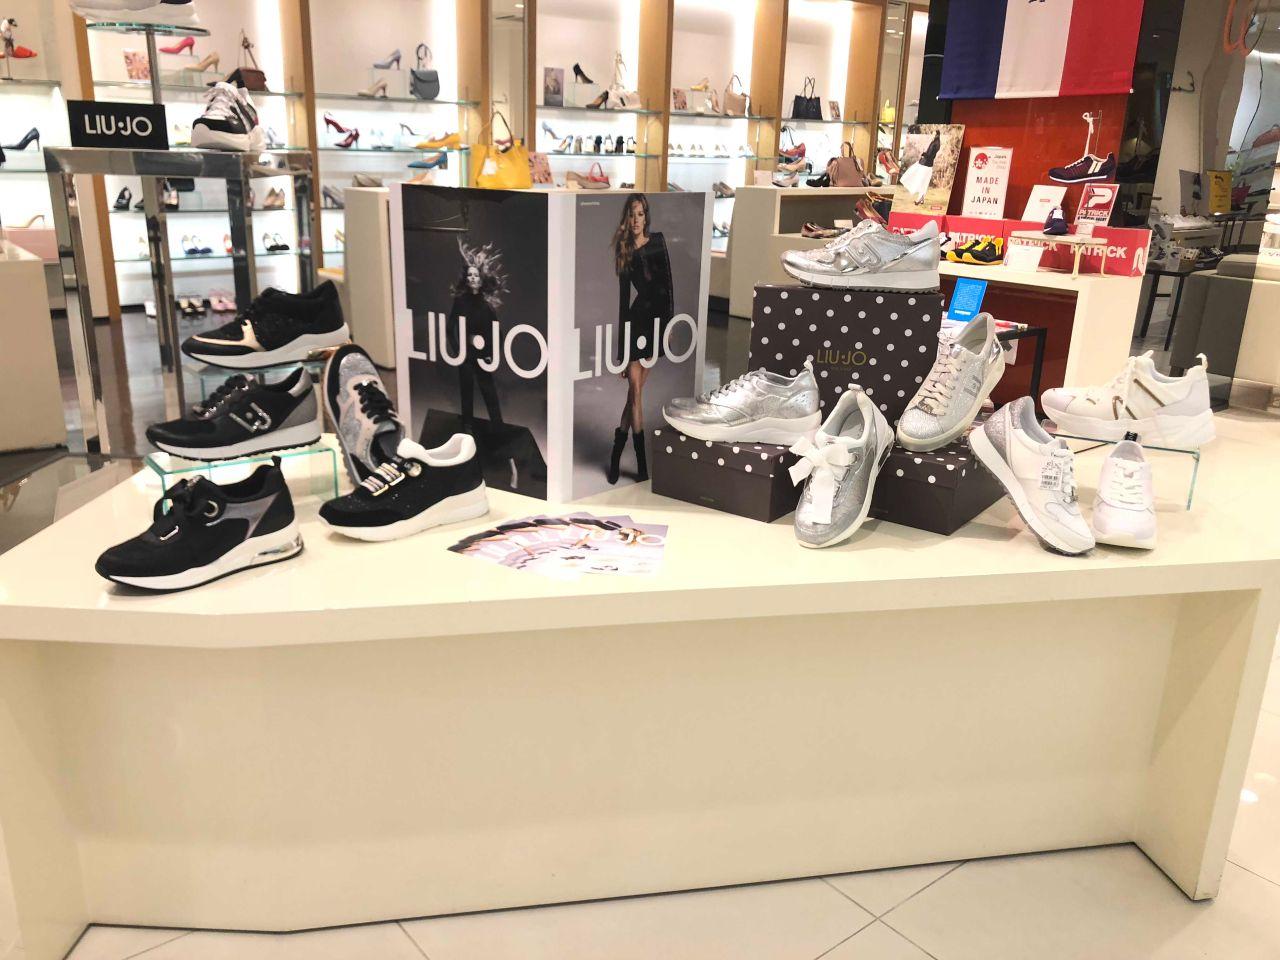 Paleto Reafirmar Anciano  LIU・JO(リュー・ジョー)スニーカーコレ... | GINZA WASHINGTON 銀座本店B1F | WASHINGTON |  銀座ワシントン靴店 公式ショップブログ